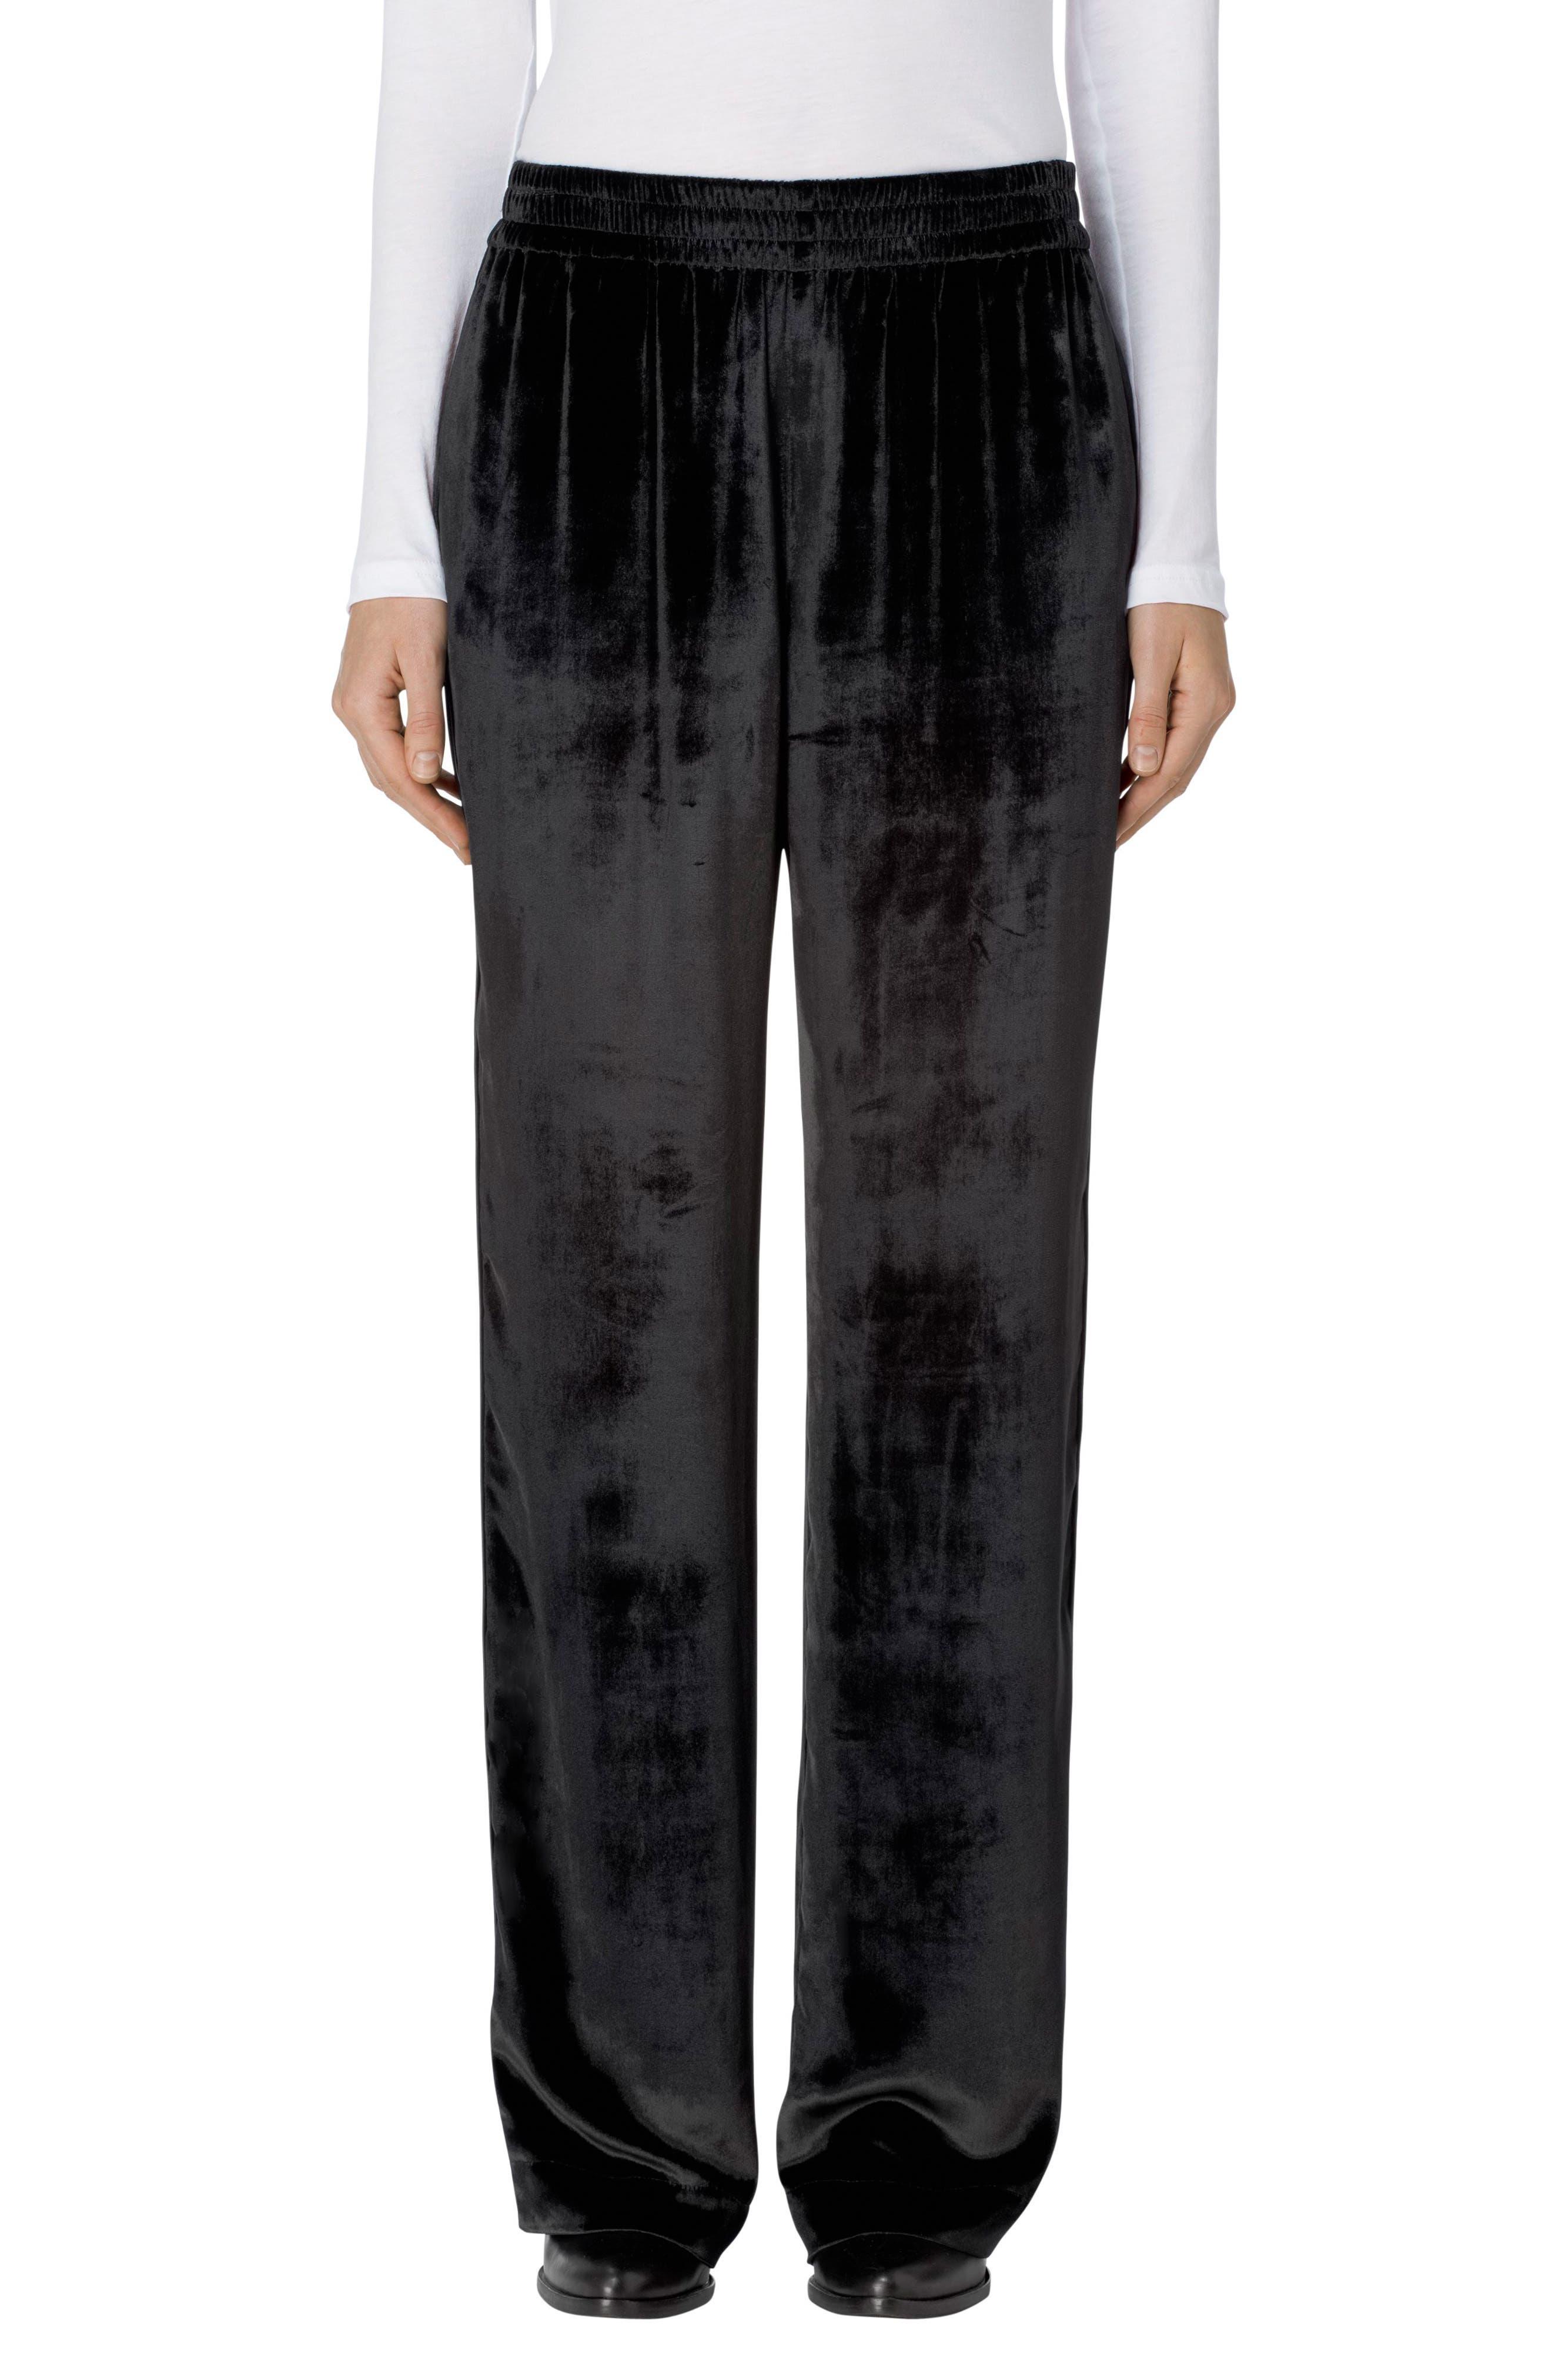 Ardon Velvet Pants,                             Main thumbnail 1, color,                             001